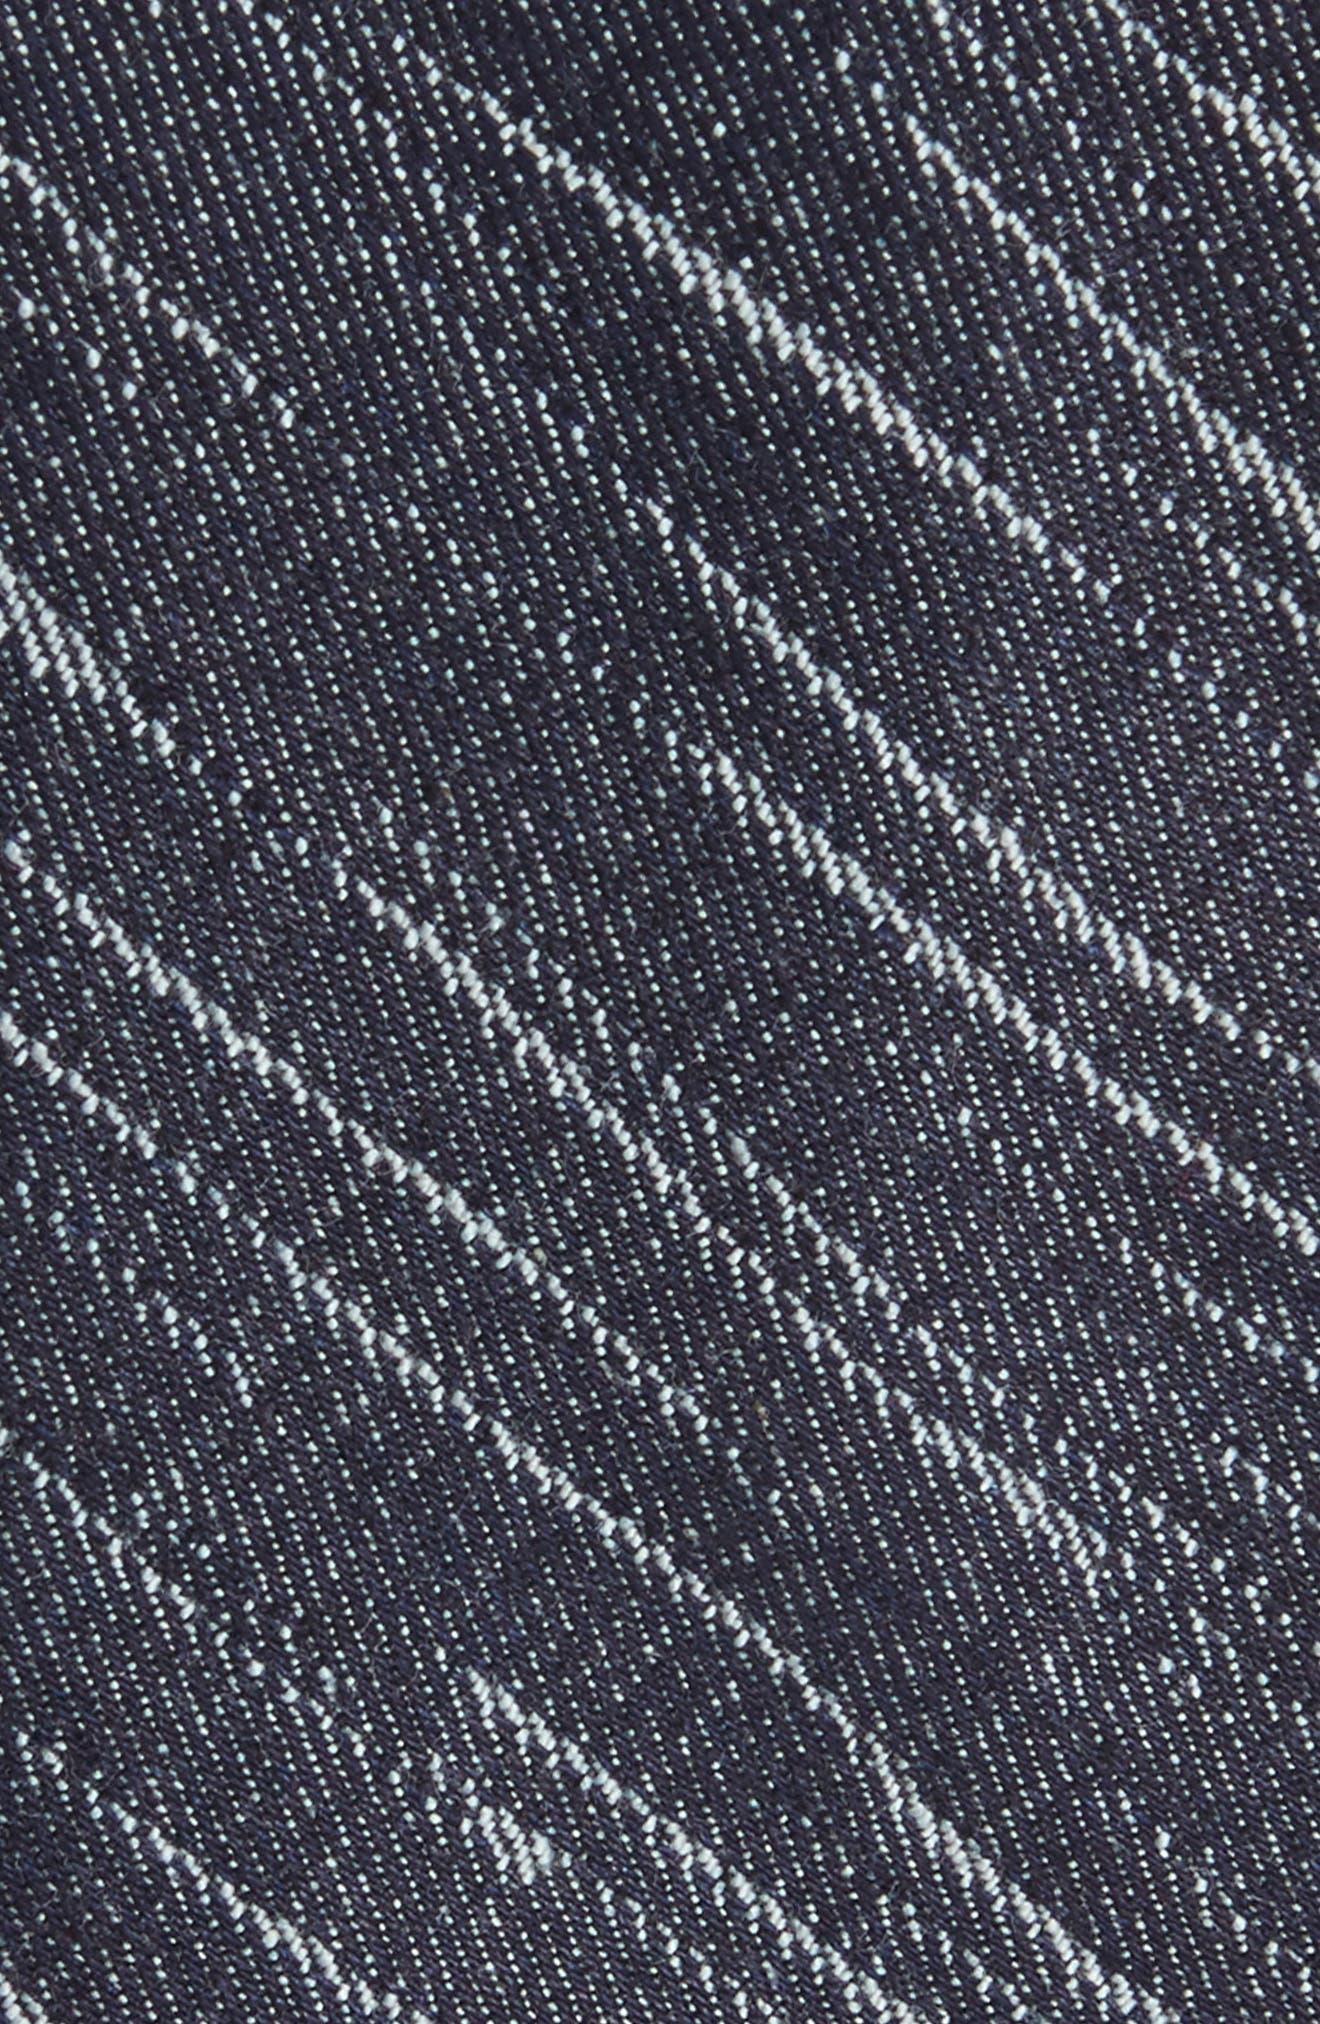 Patchwork Denim Skinny Tie,                             Alternate thumbnail 2, color,                             Denim